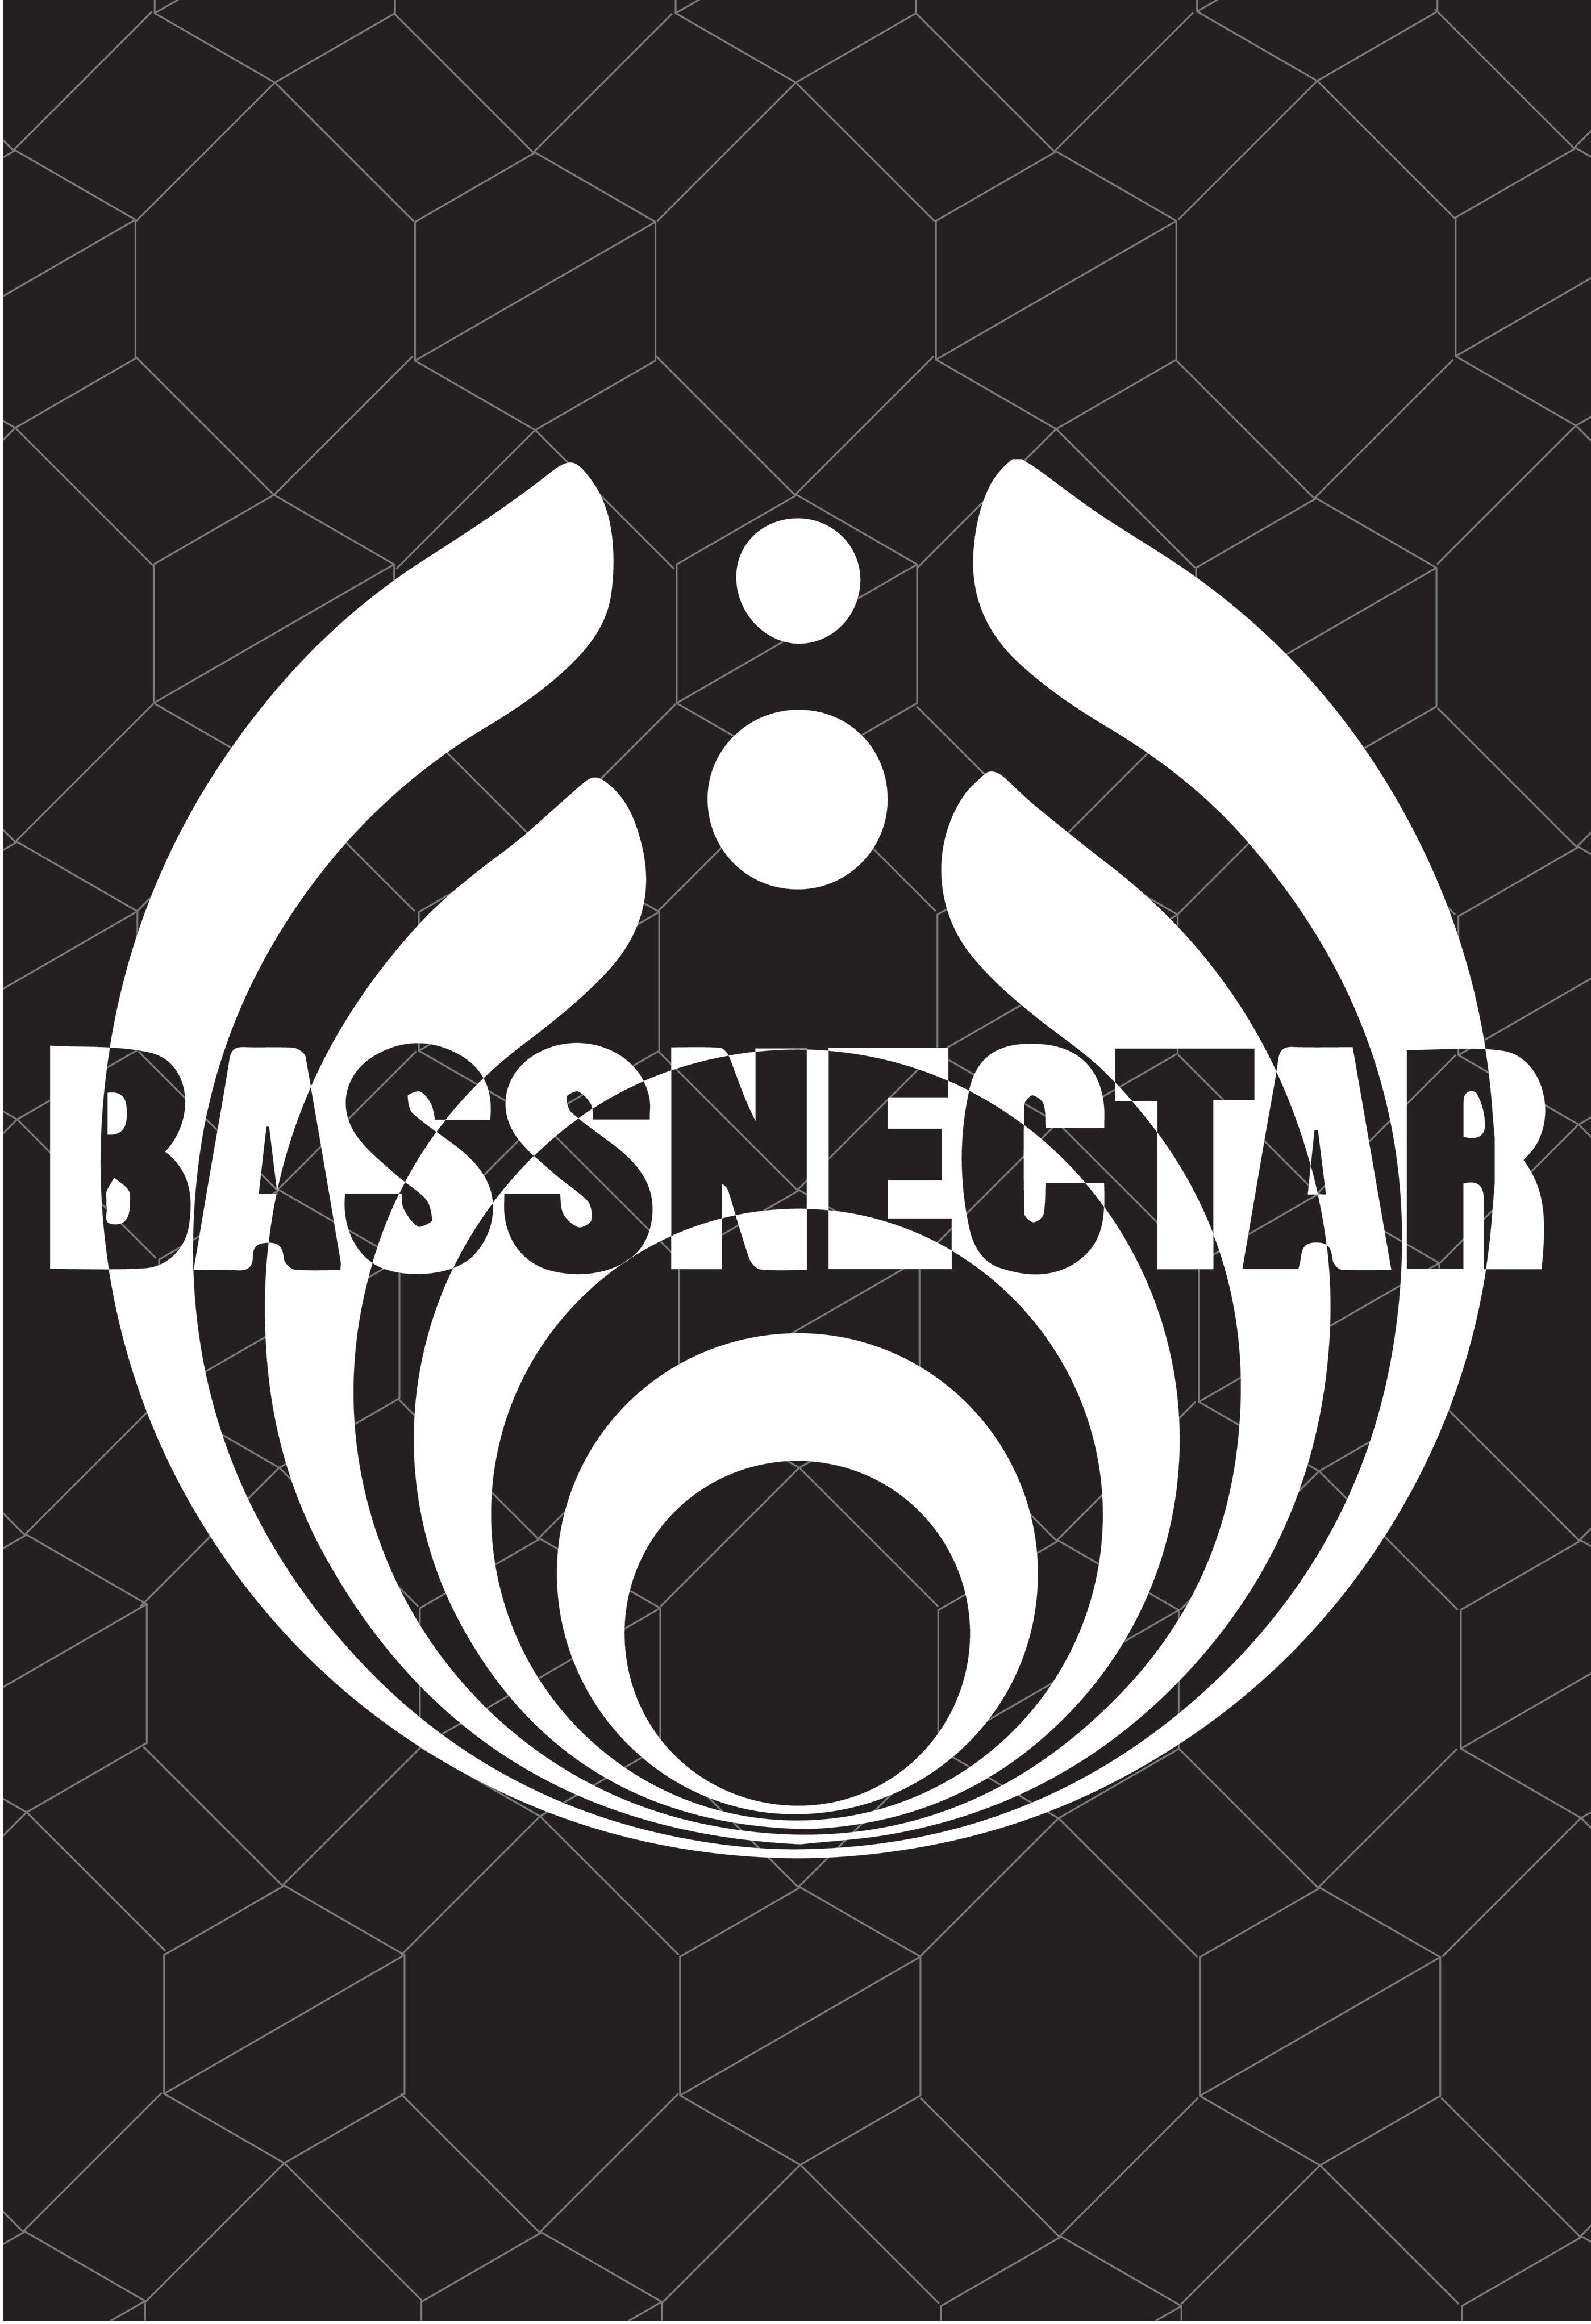 Bassnectar Poster